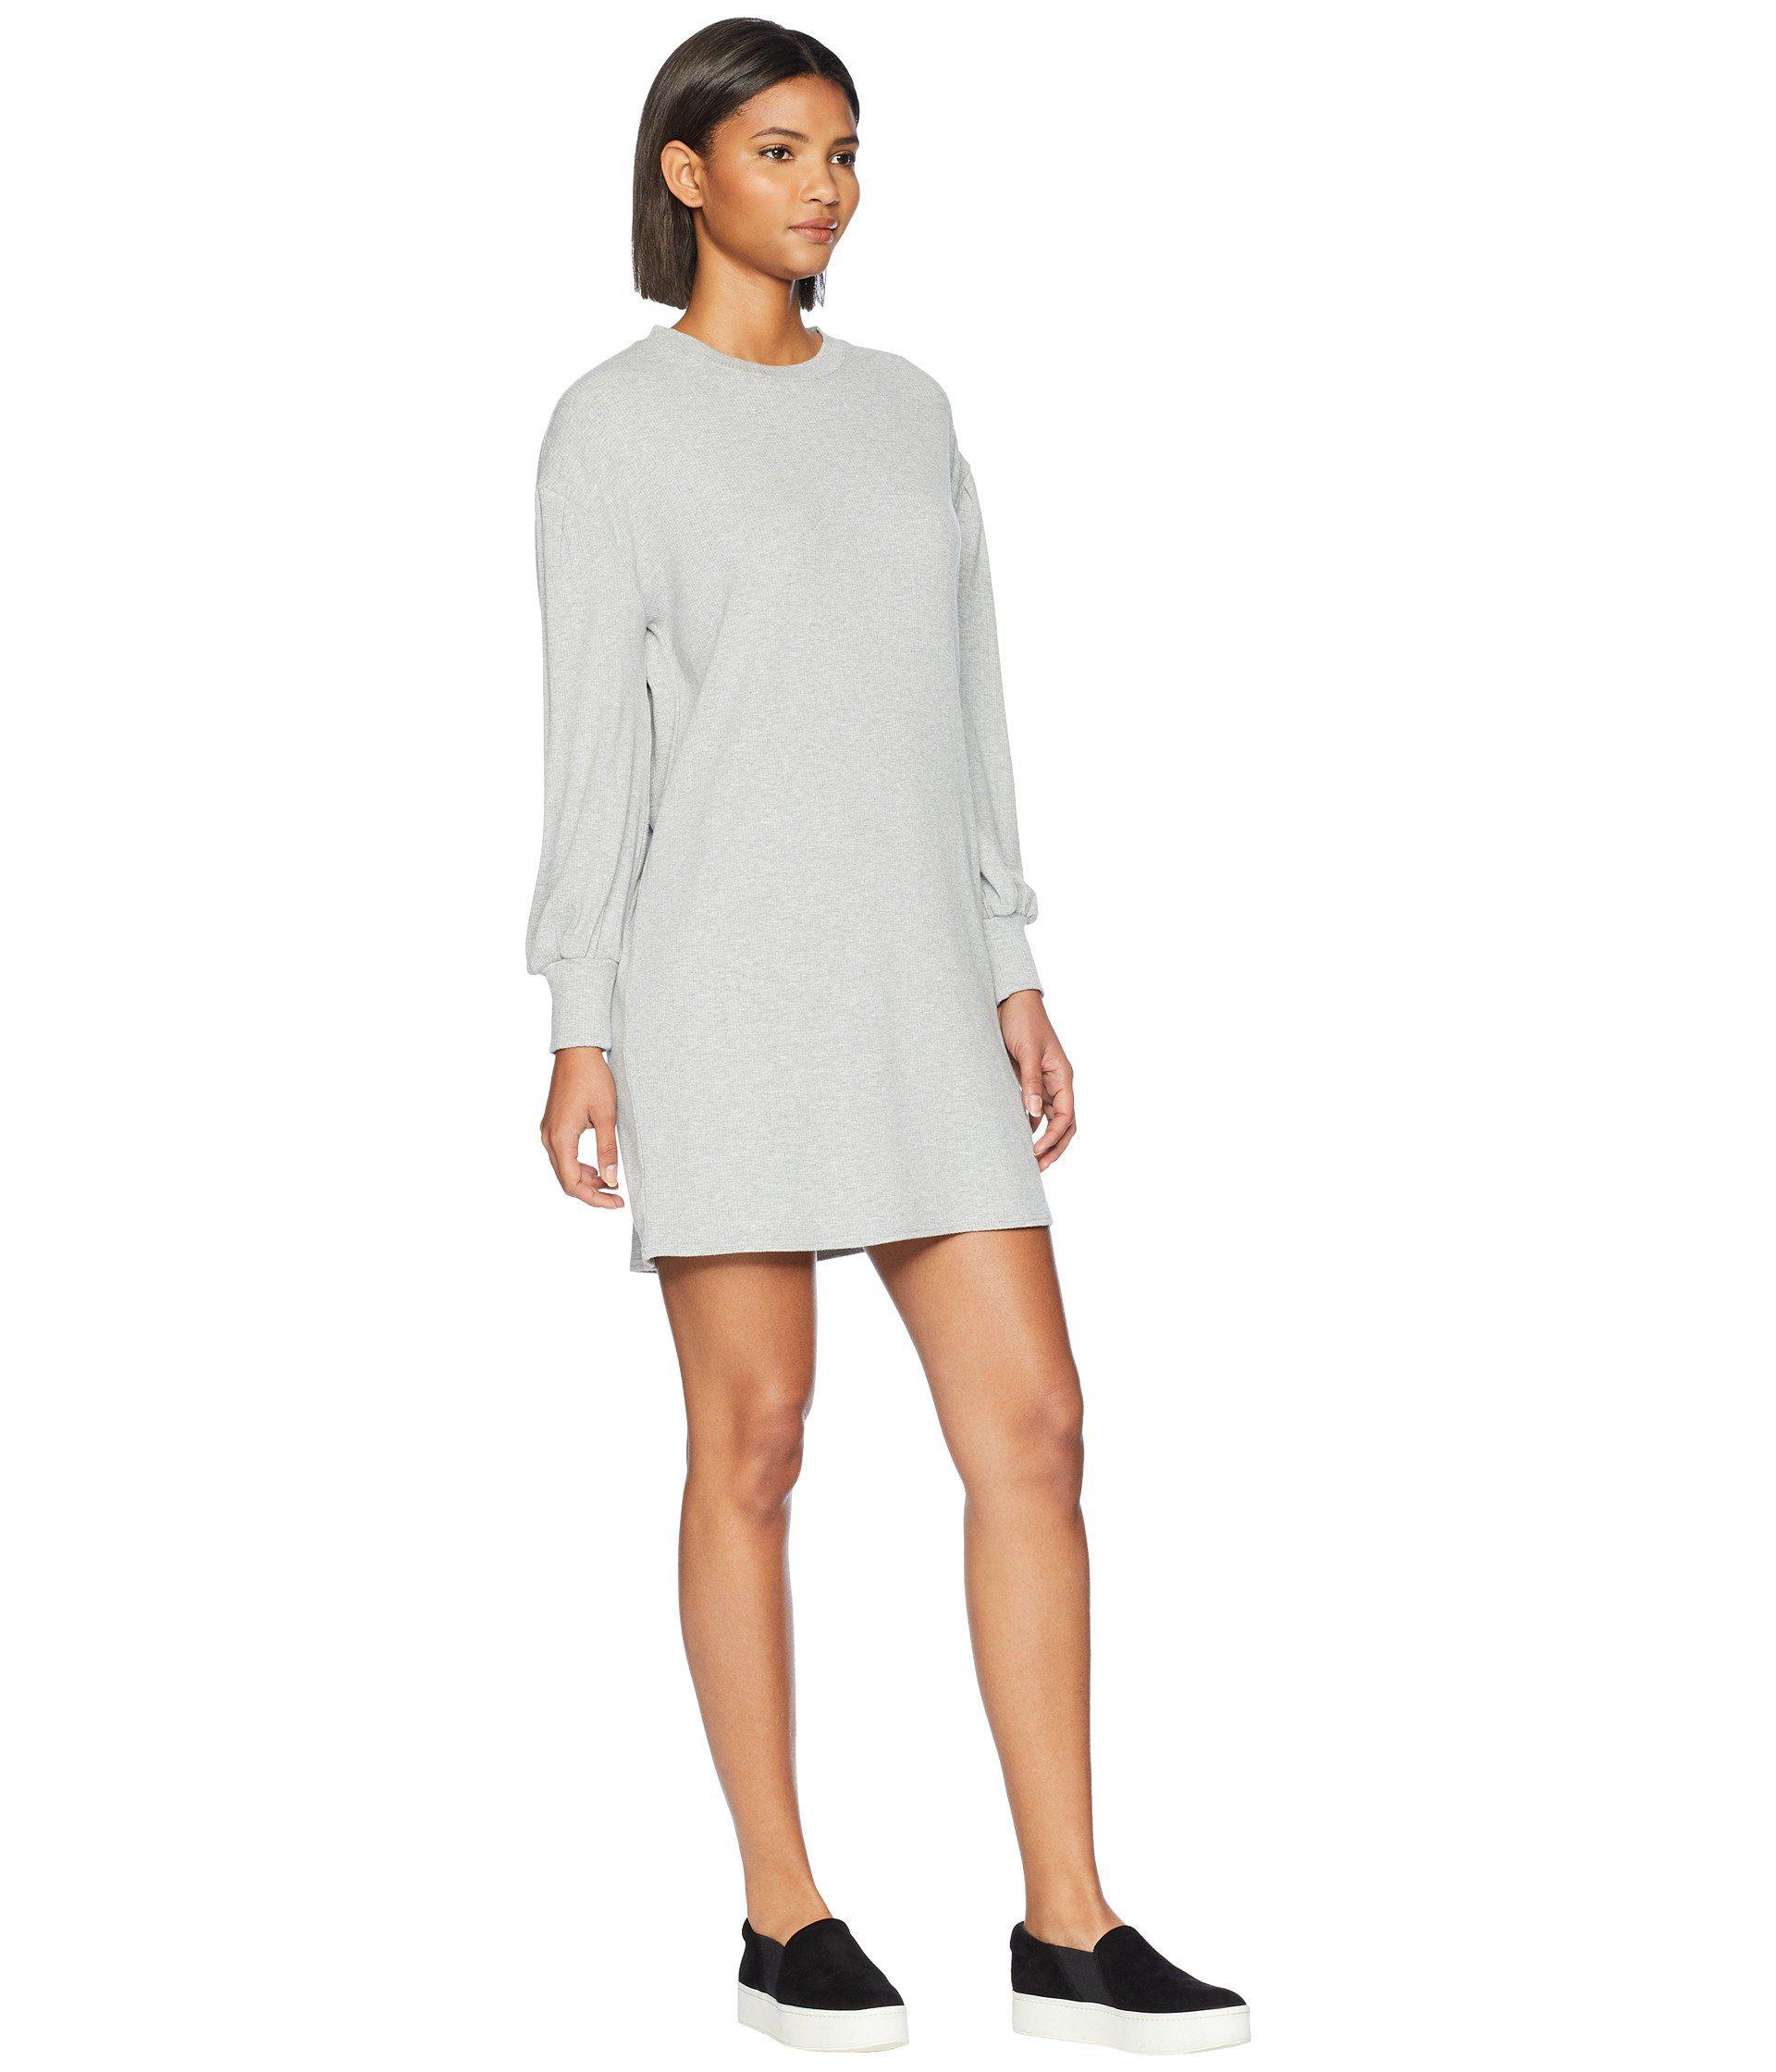 863c5bde31 Volcom - Gray Lil Long Sleeve Dress - Lyst. View fullscreen